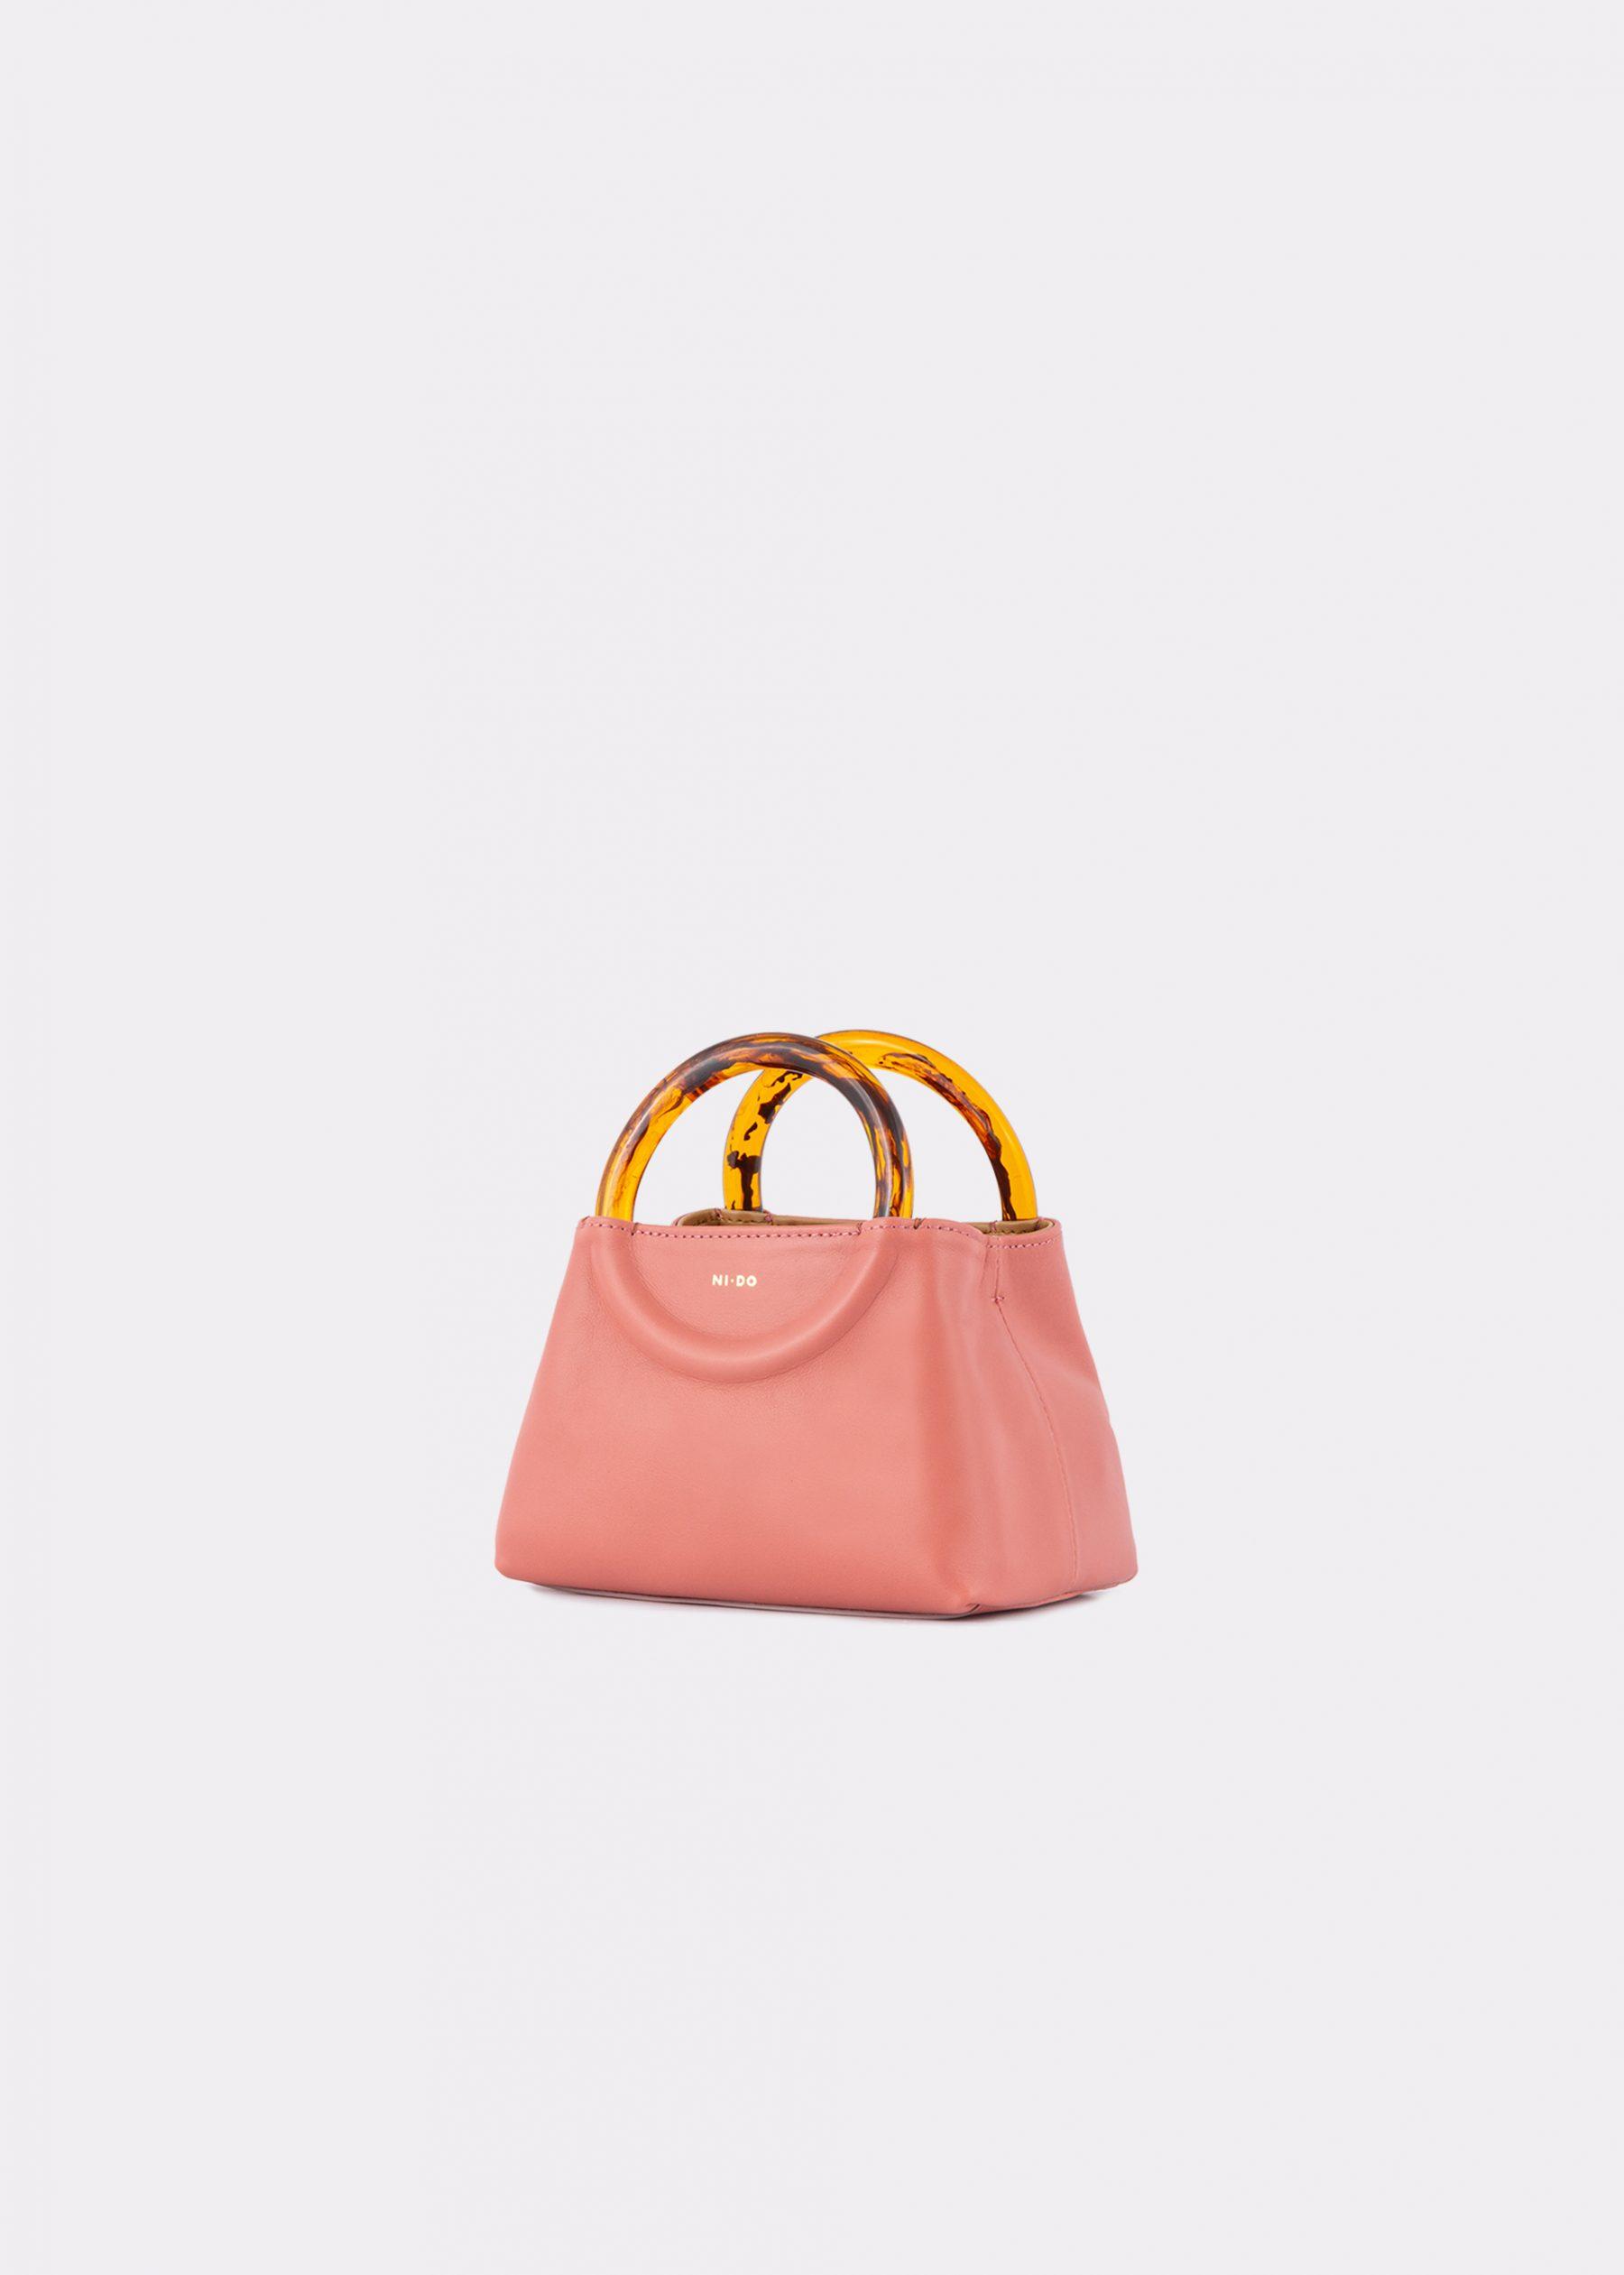 NIDO-Bolla_Micro-bag-blush_side view